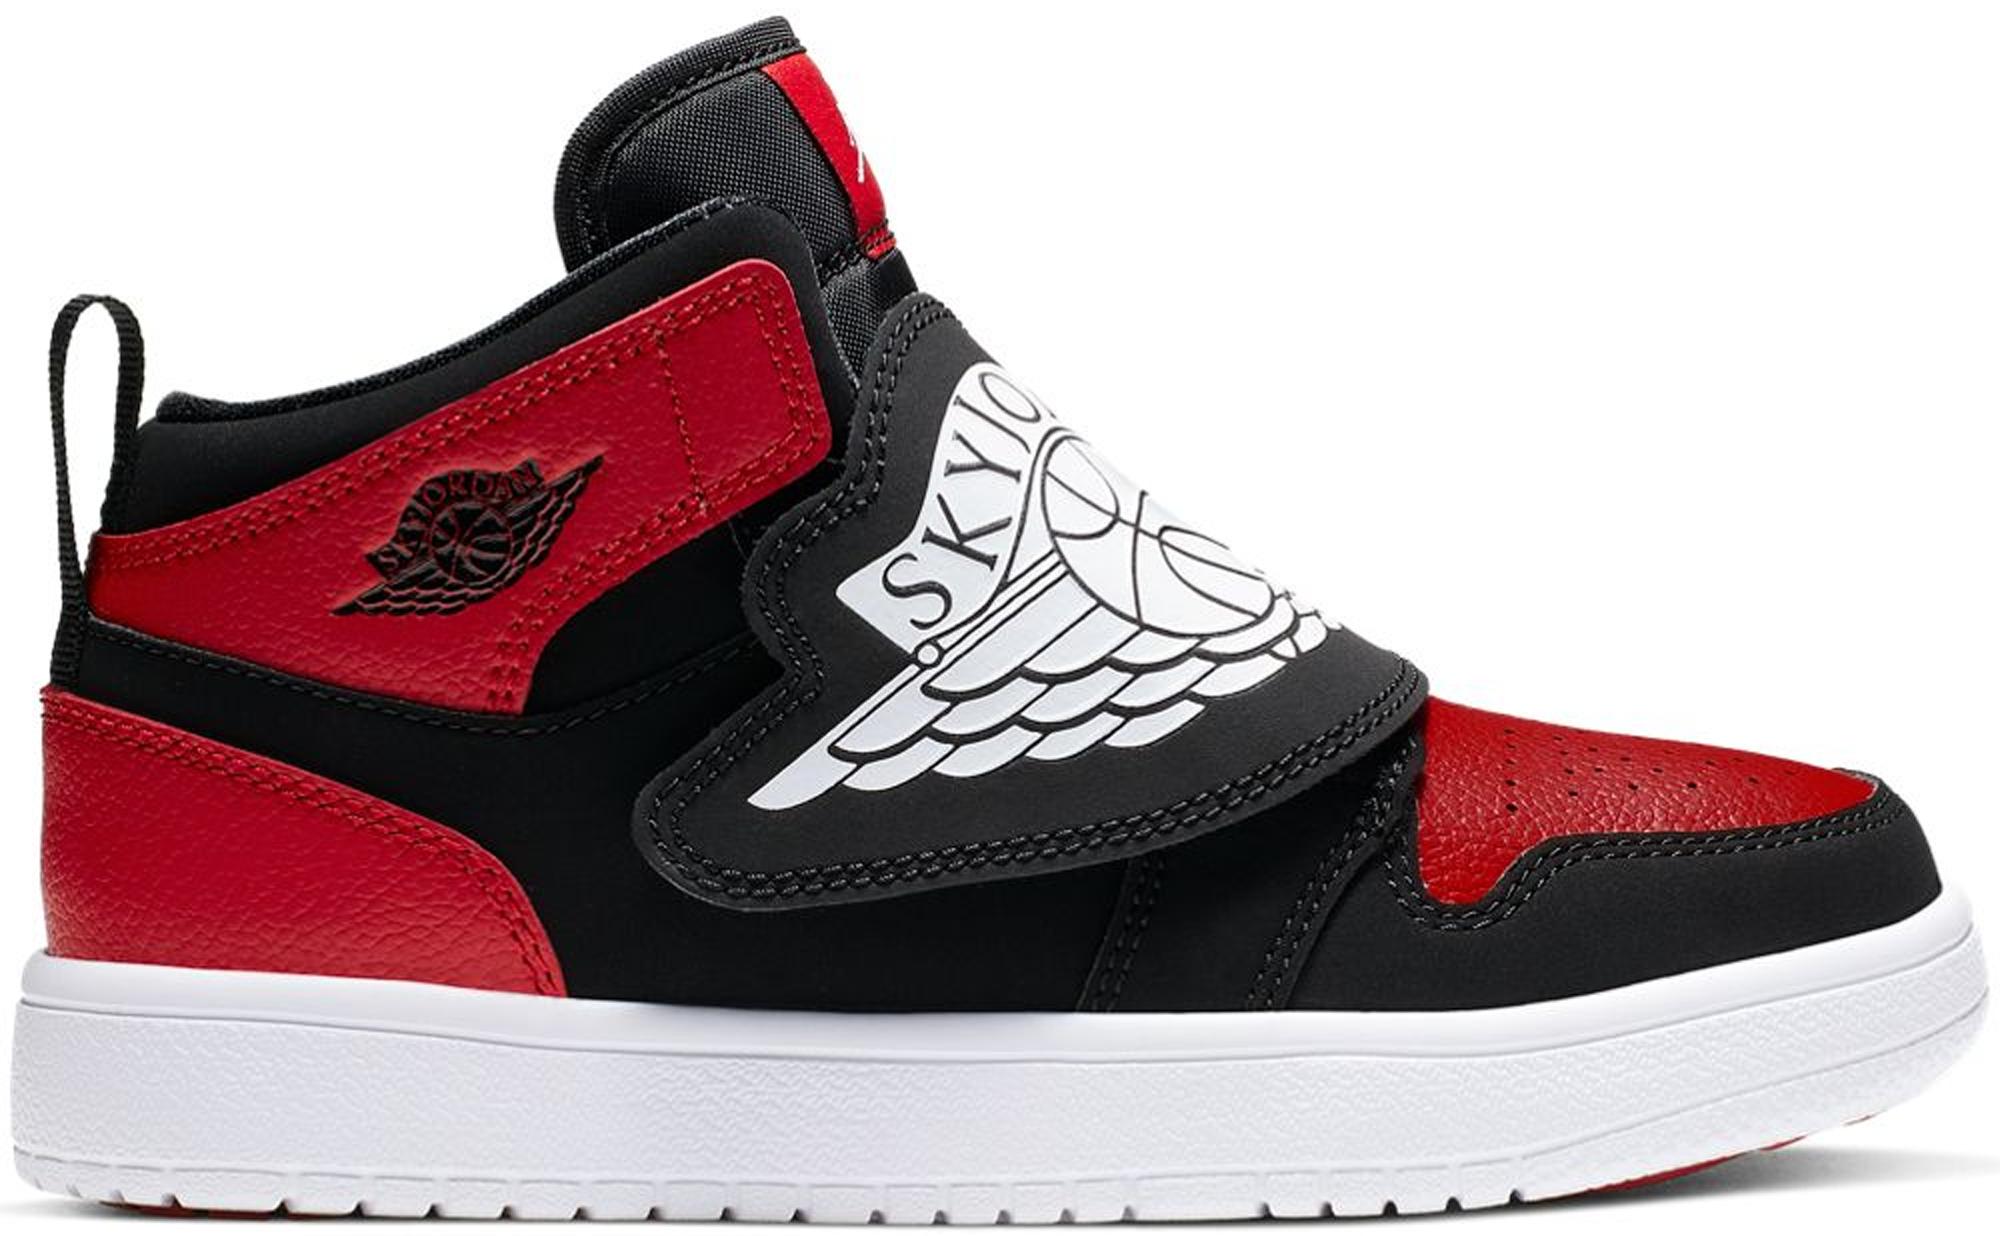 Sky Jordan 1 Bred (PS) - BQ7197-001